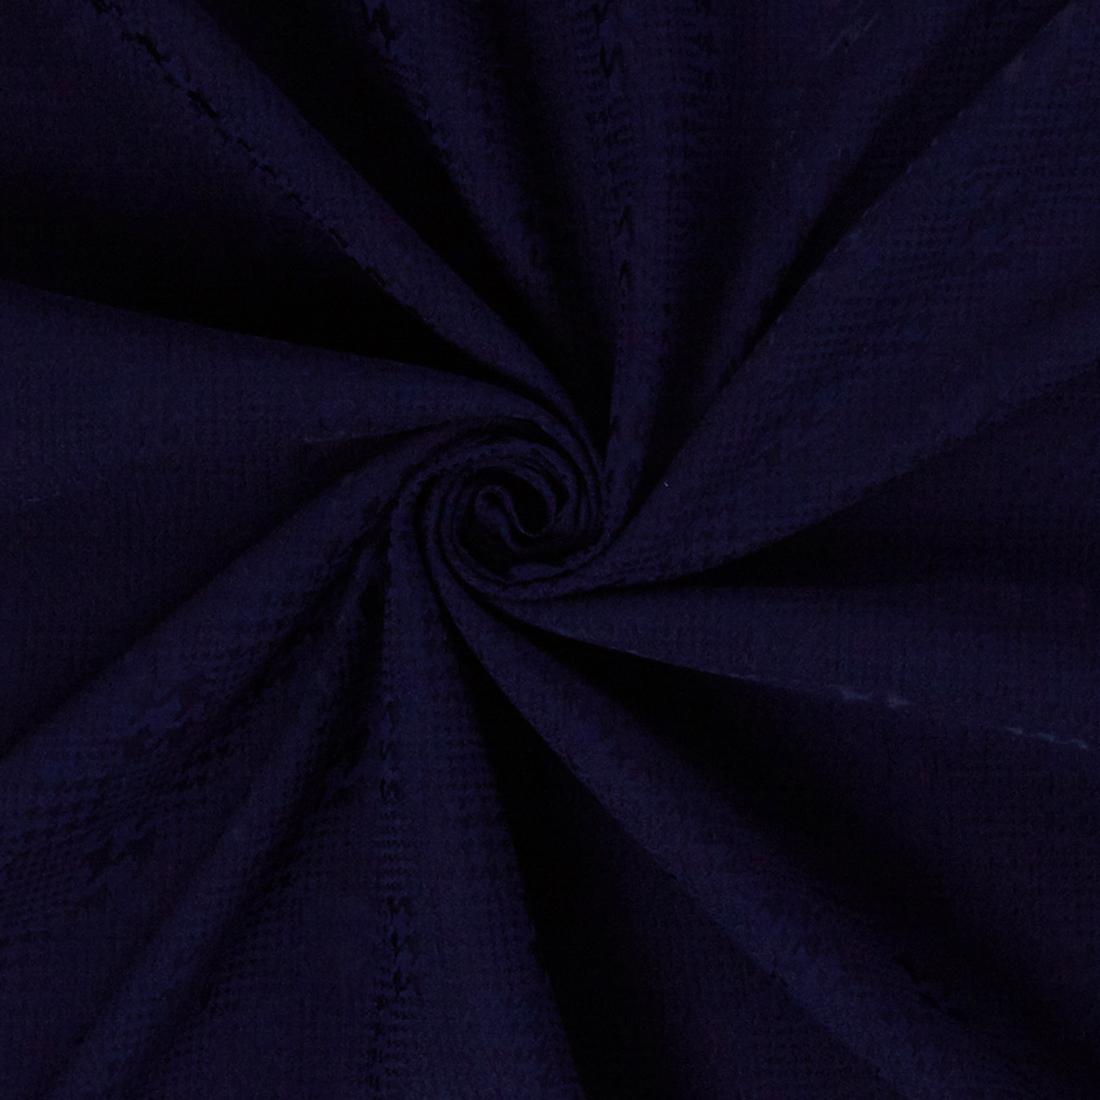 Texture Viscose Ink Dress Fabric